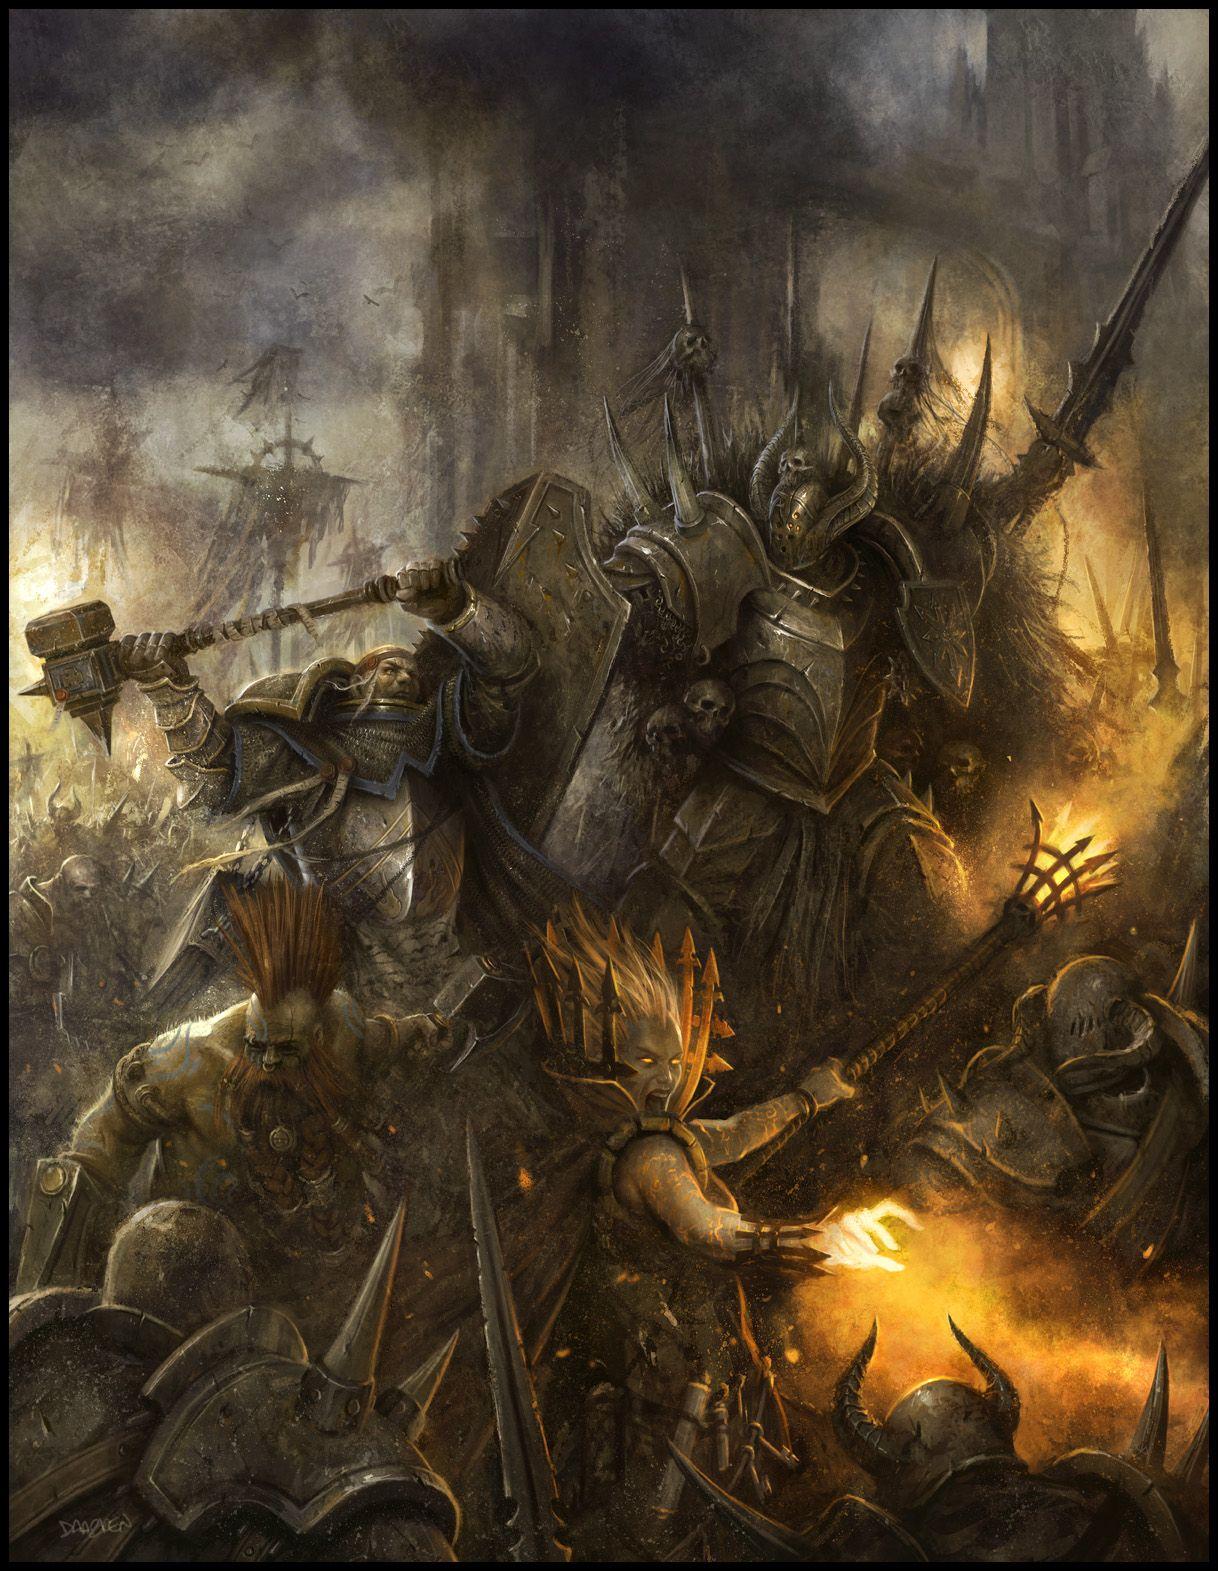 Warhammer Fantasy Roleplay, Fantasy Battle, High Fantasy, Sci Fi Fantasy, Medieval  Fantasy